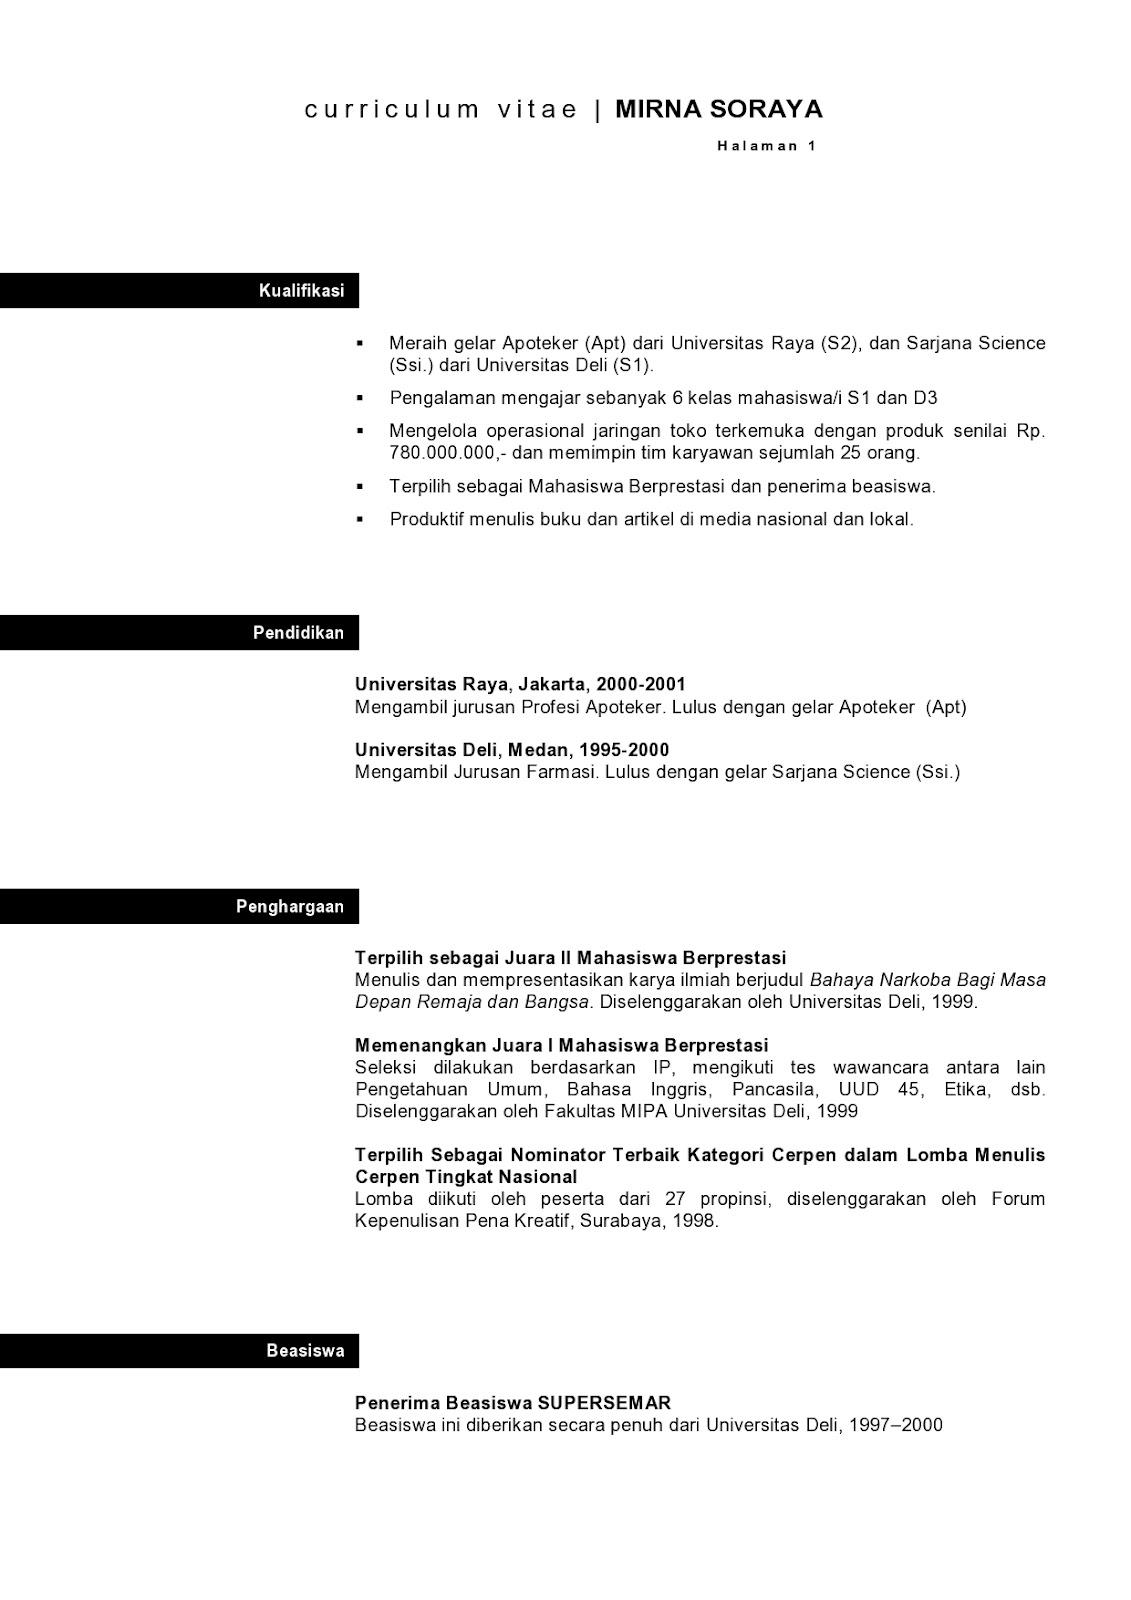 Contoh Curriculum Vitae Dalam Bahasa Indonesia Translation Cv Nabila